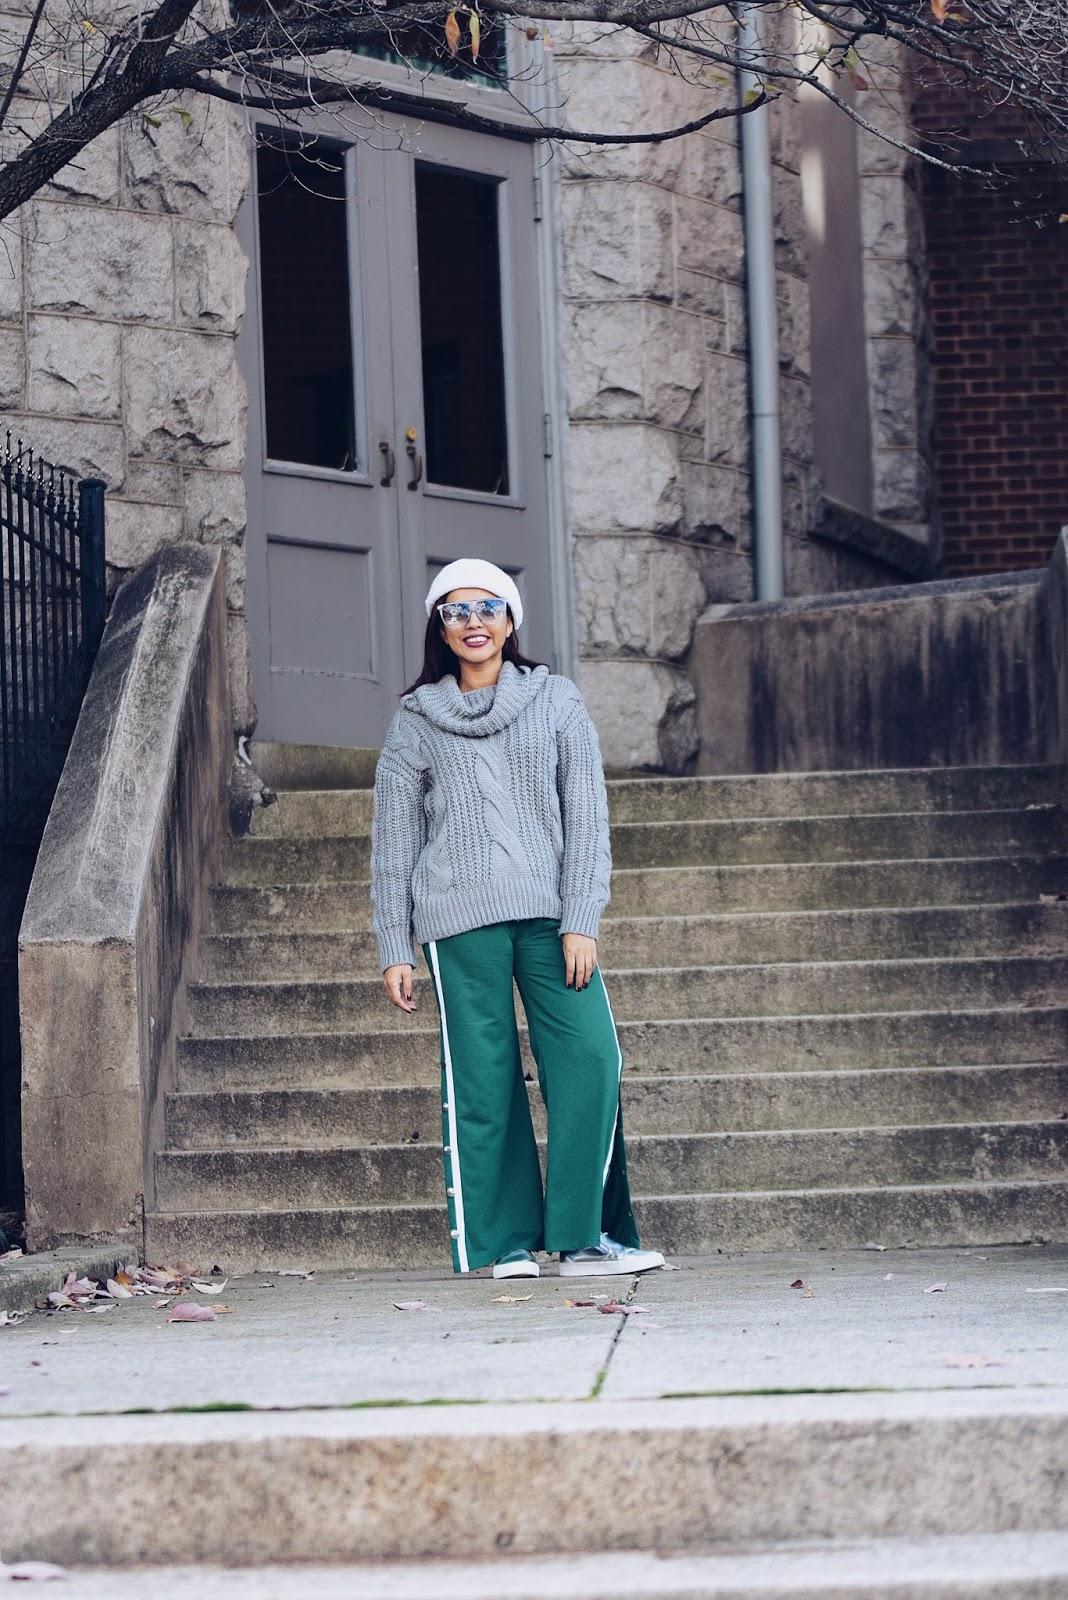 Sporty Chic For Thanksgiving -los chuchis-mariestilotravels-sporty pants-hoodie bi color-moda el salvador-dcblogger-fashionblogger-streetstyle-acción de gracias-visit richmond-virginia is for lovers-visit virginia-los chuchis-cable sweater